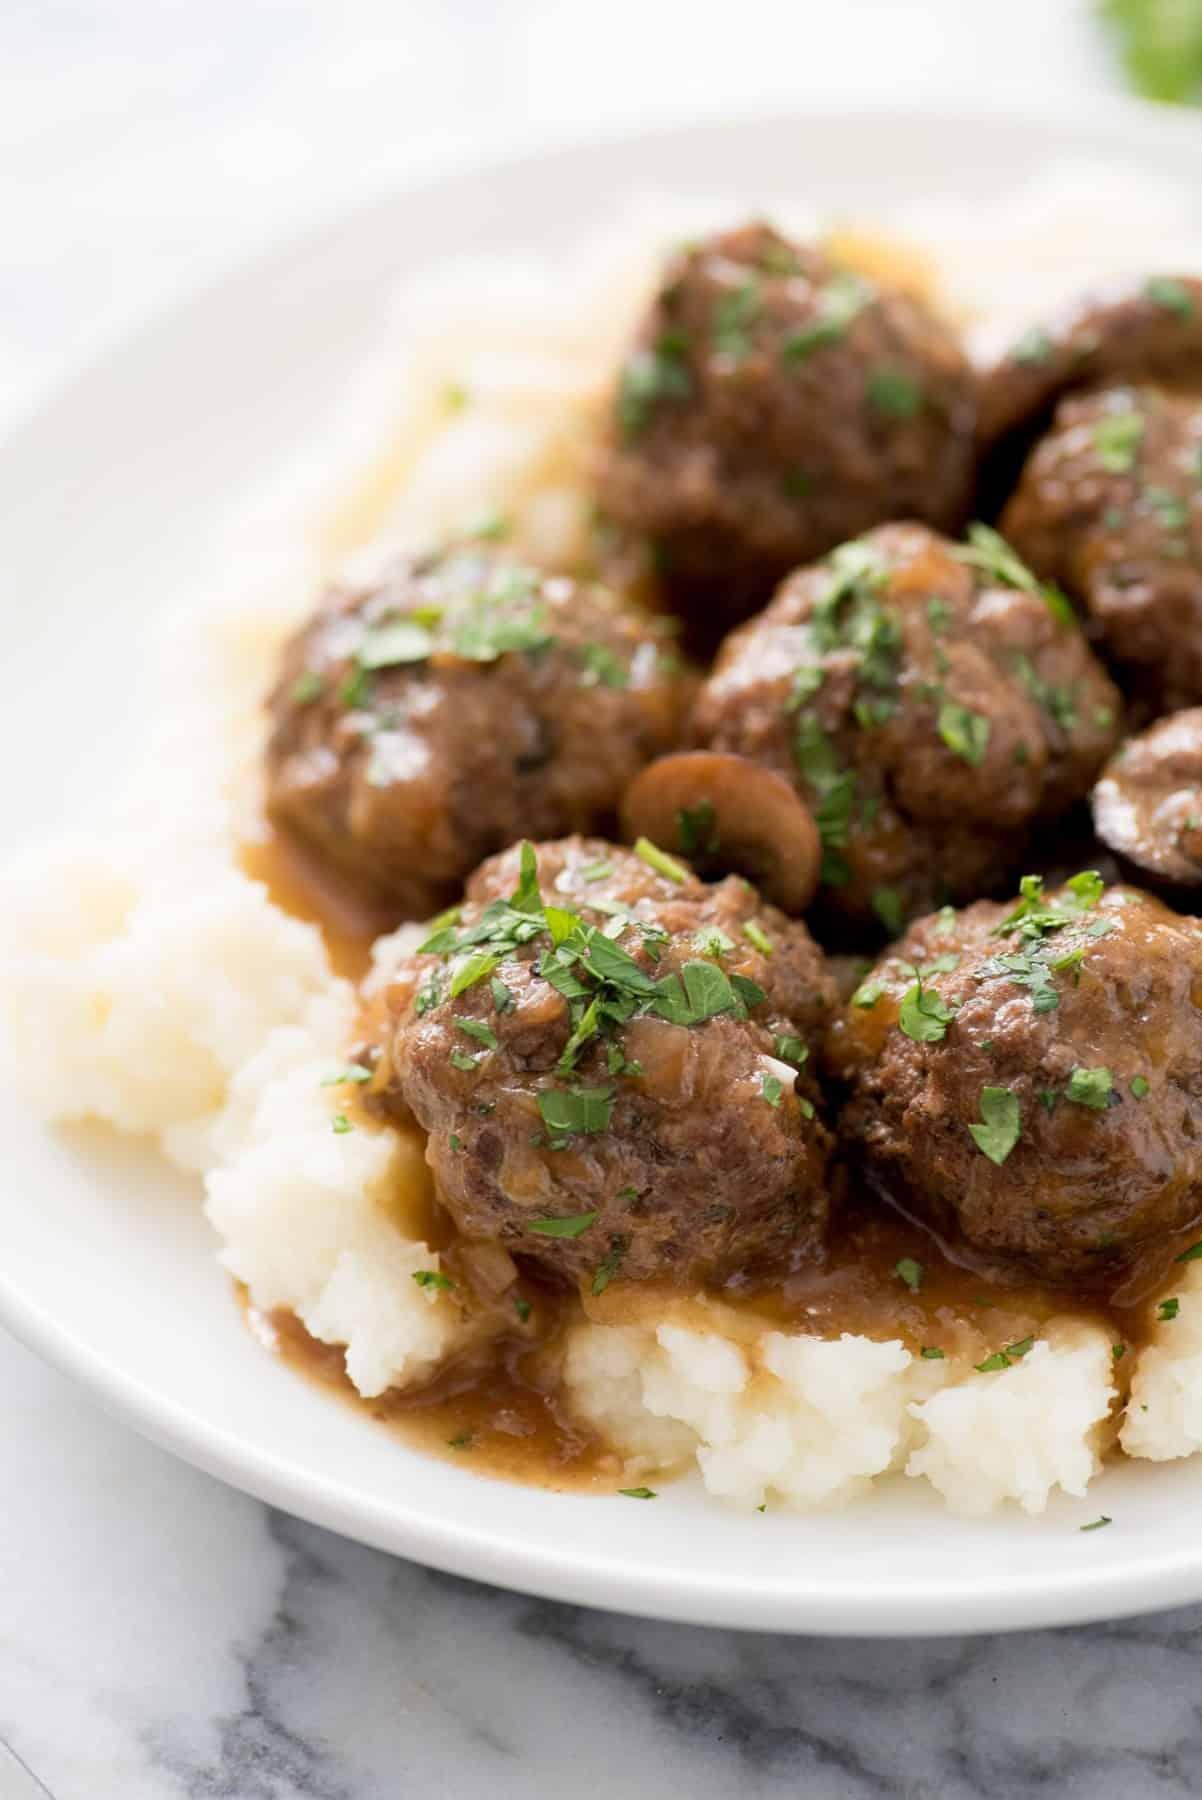 Instant Pot Swedish Meatballs with Mushroom Gravy